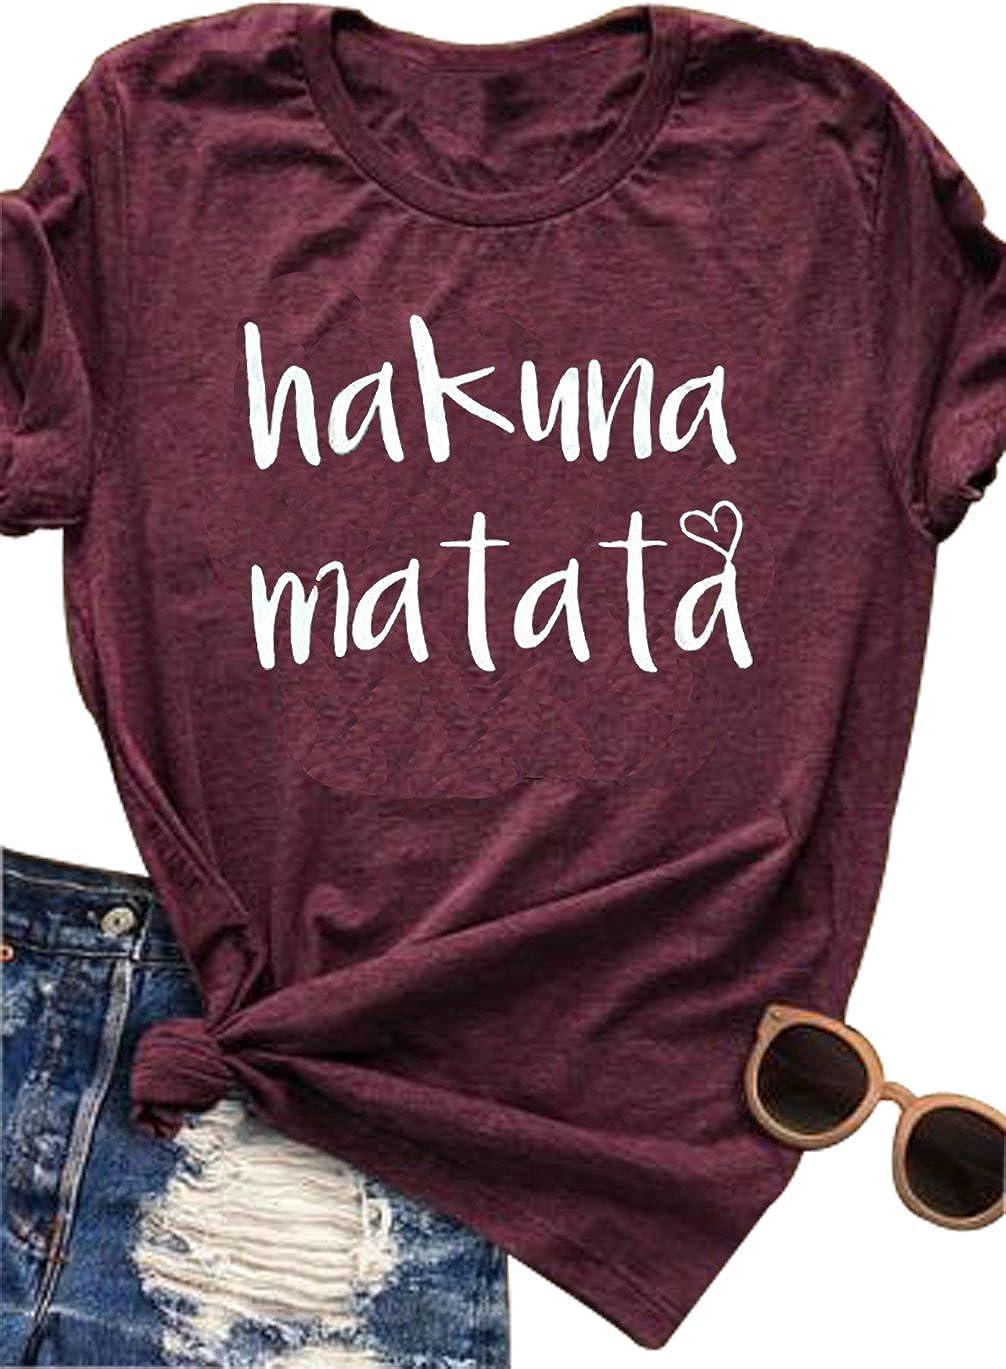 VILOVE Women's Hakuna Matata Letter Print Funny T Shirt Short Sleeve Tee Top Casual